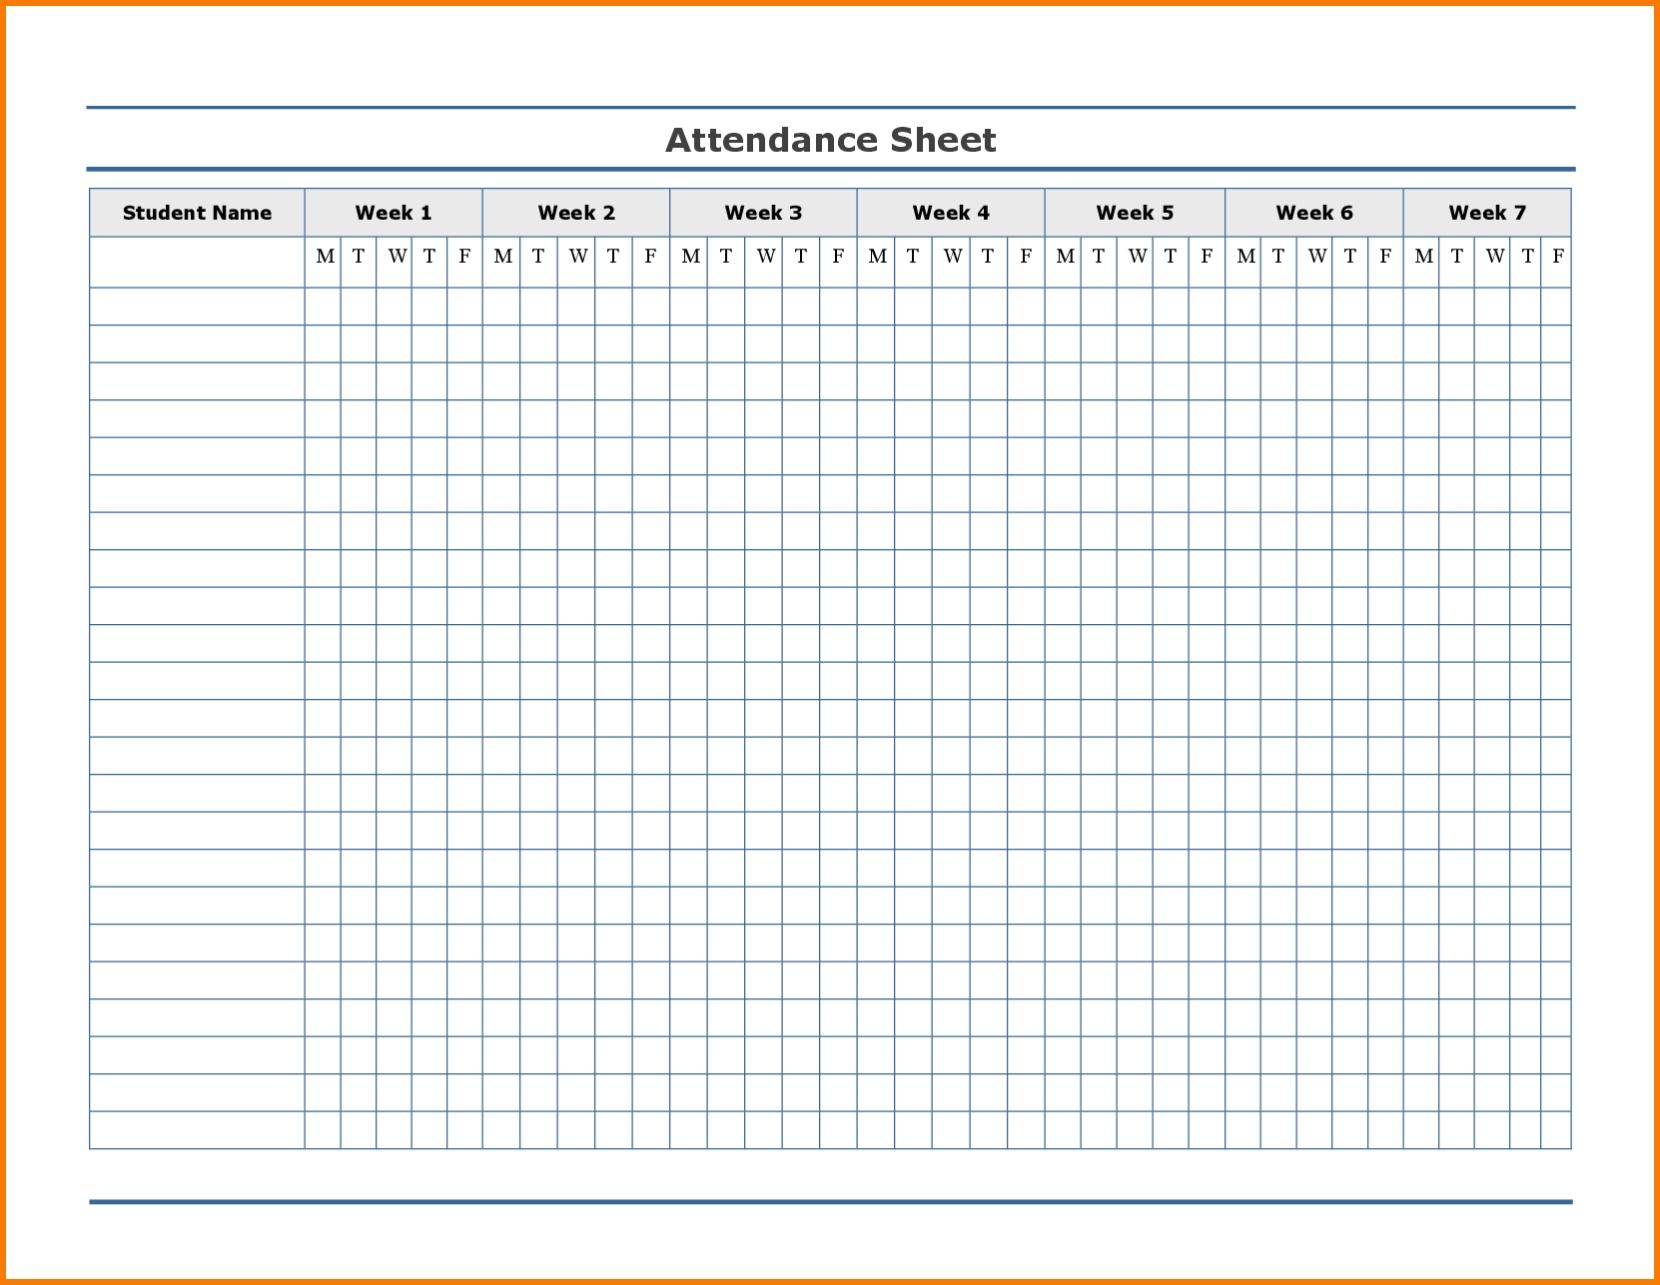 Employee Attendance Excel Sheet | Employee Attendance Sheet-2020 Employee Attendance Tracker Template Free